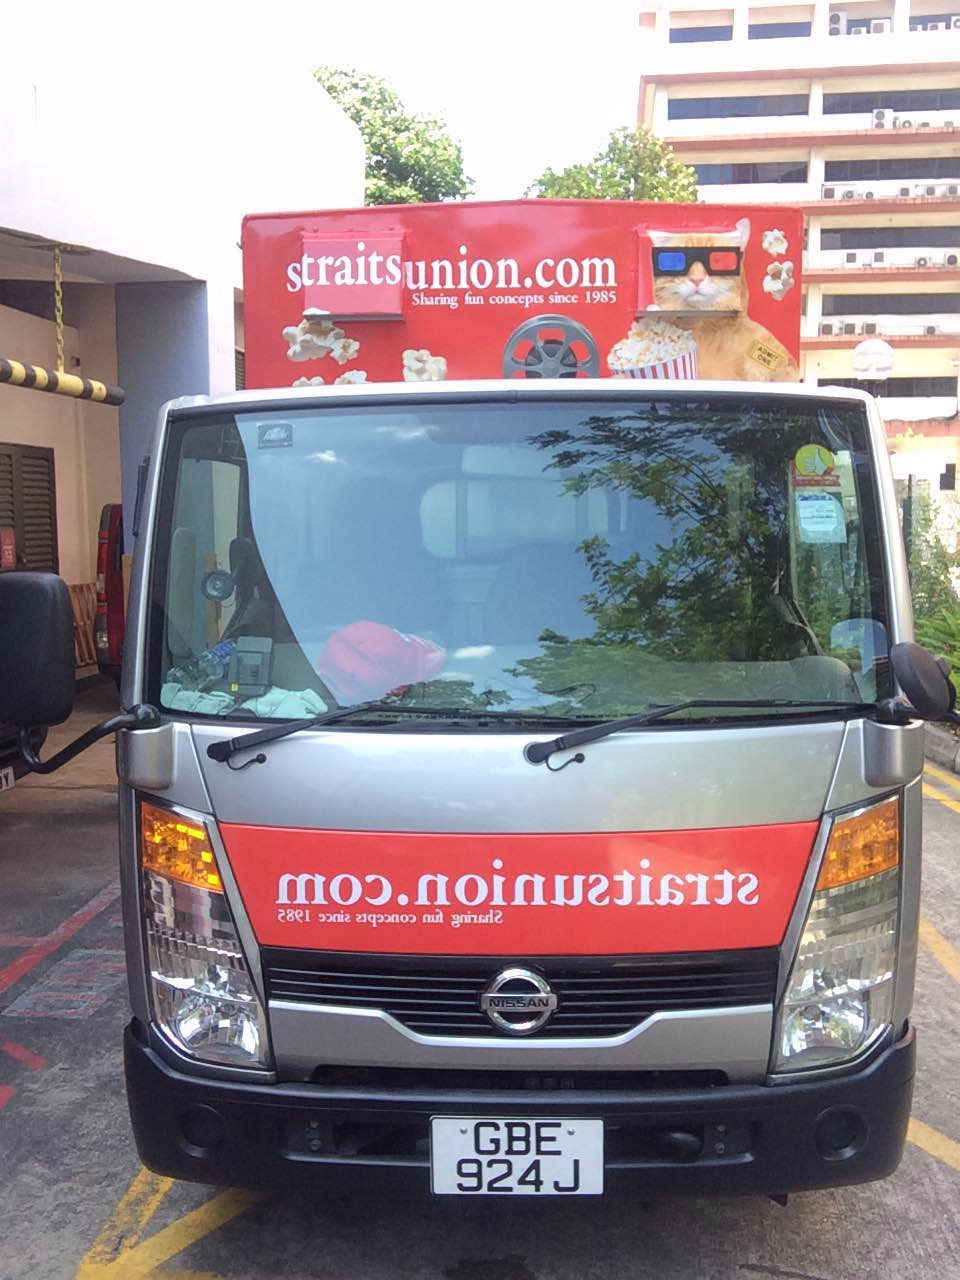 Popcorn Supplier in Singapore